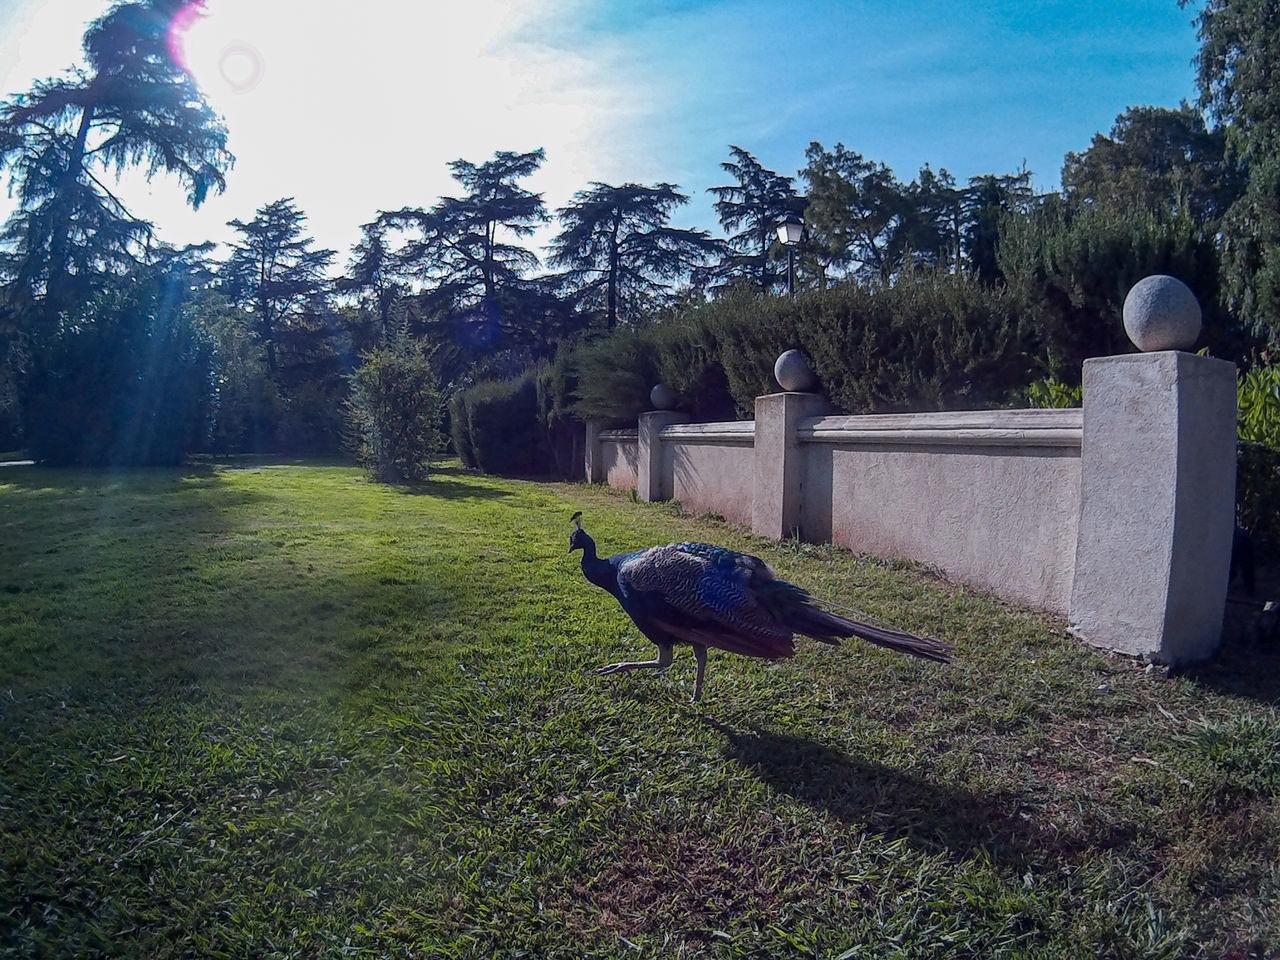 BIRD IN A PARK